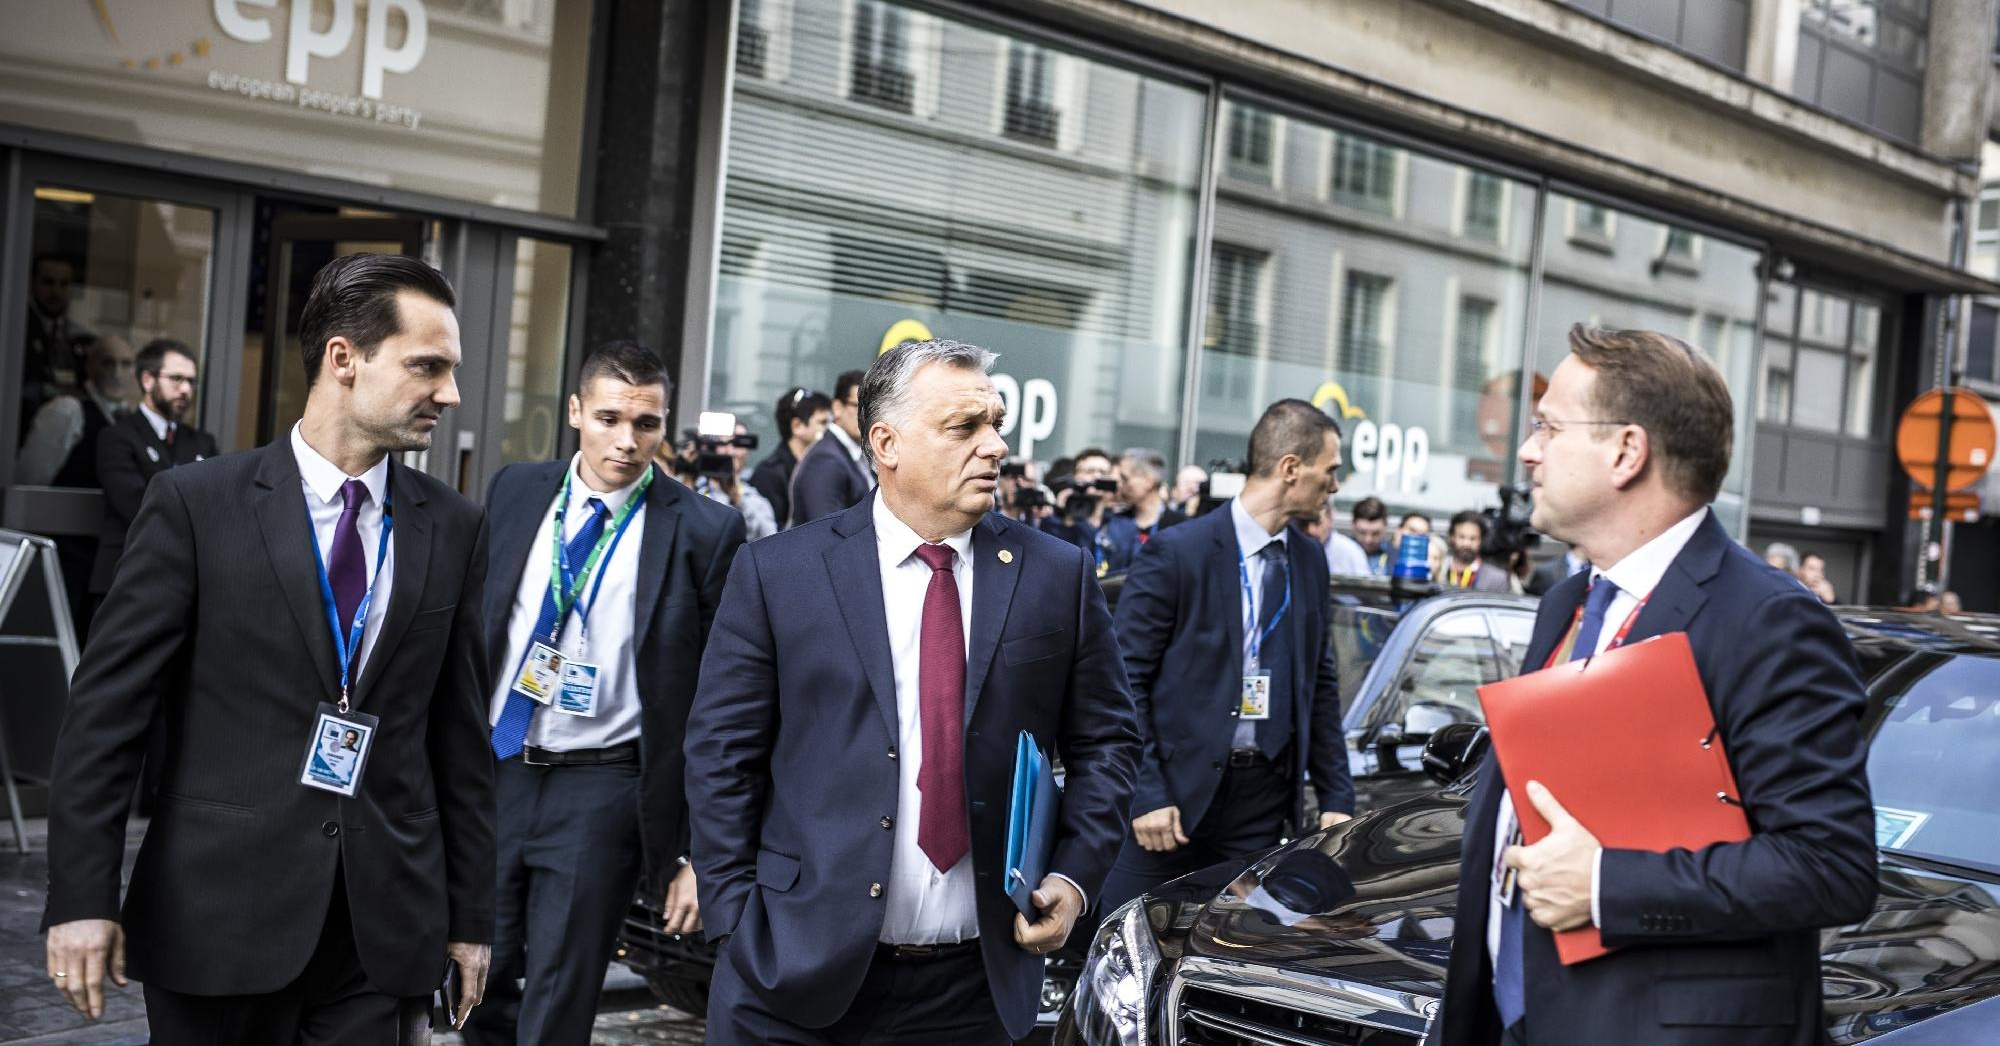 Mit hagy maga után Orbán?